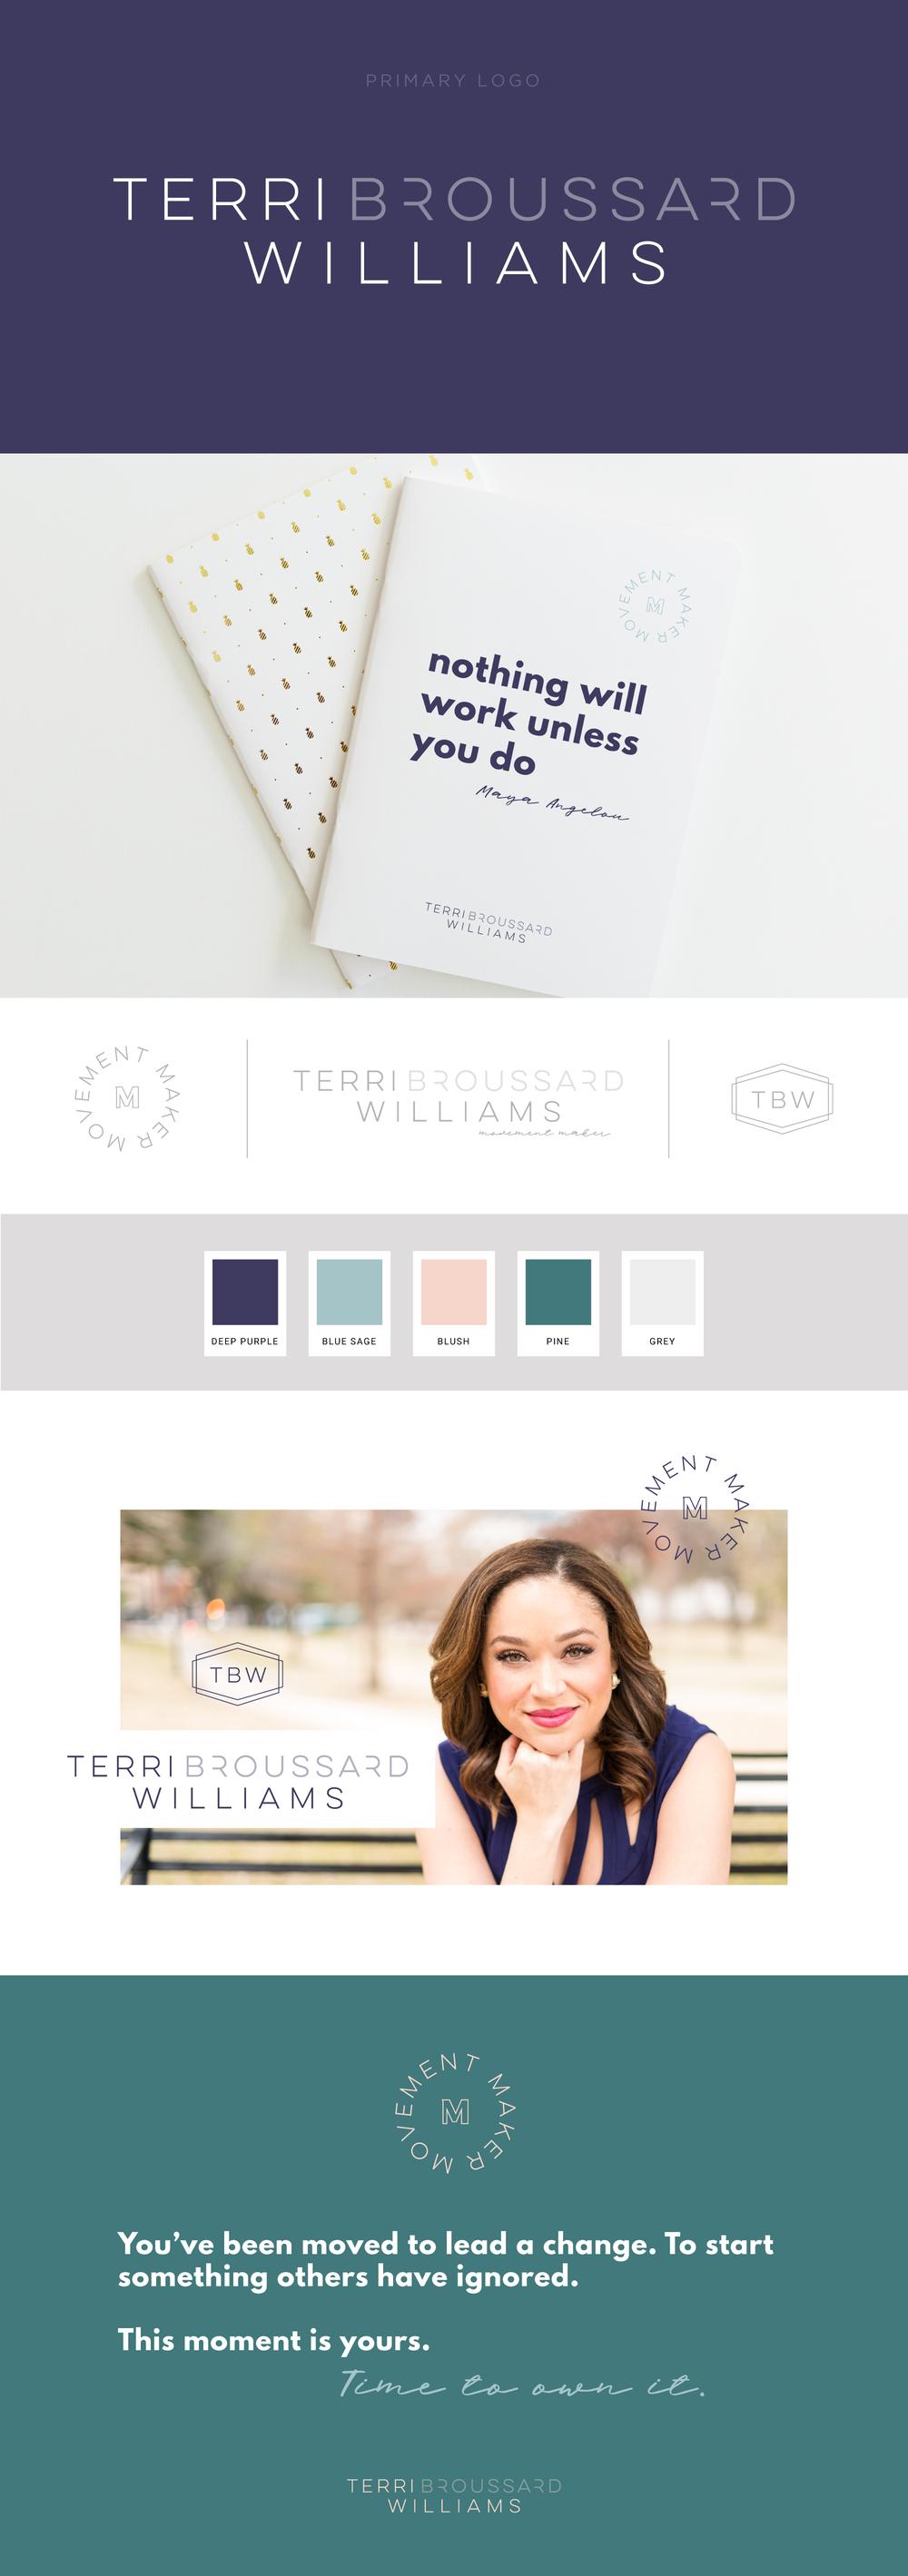 Terri Broussard Williams brand design | Designed by Pace Creative Design Studio